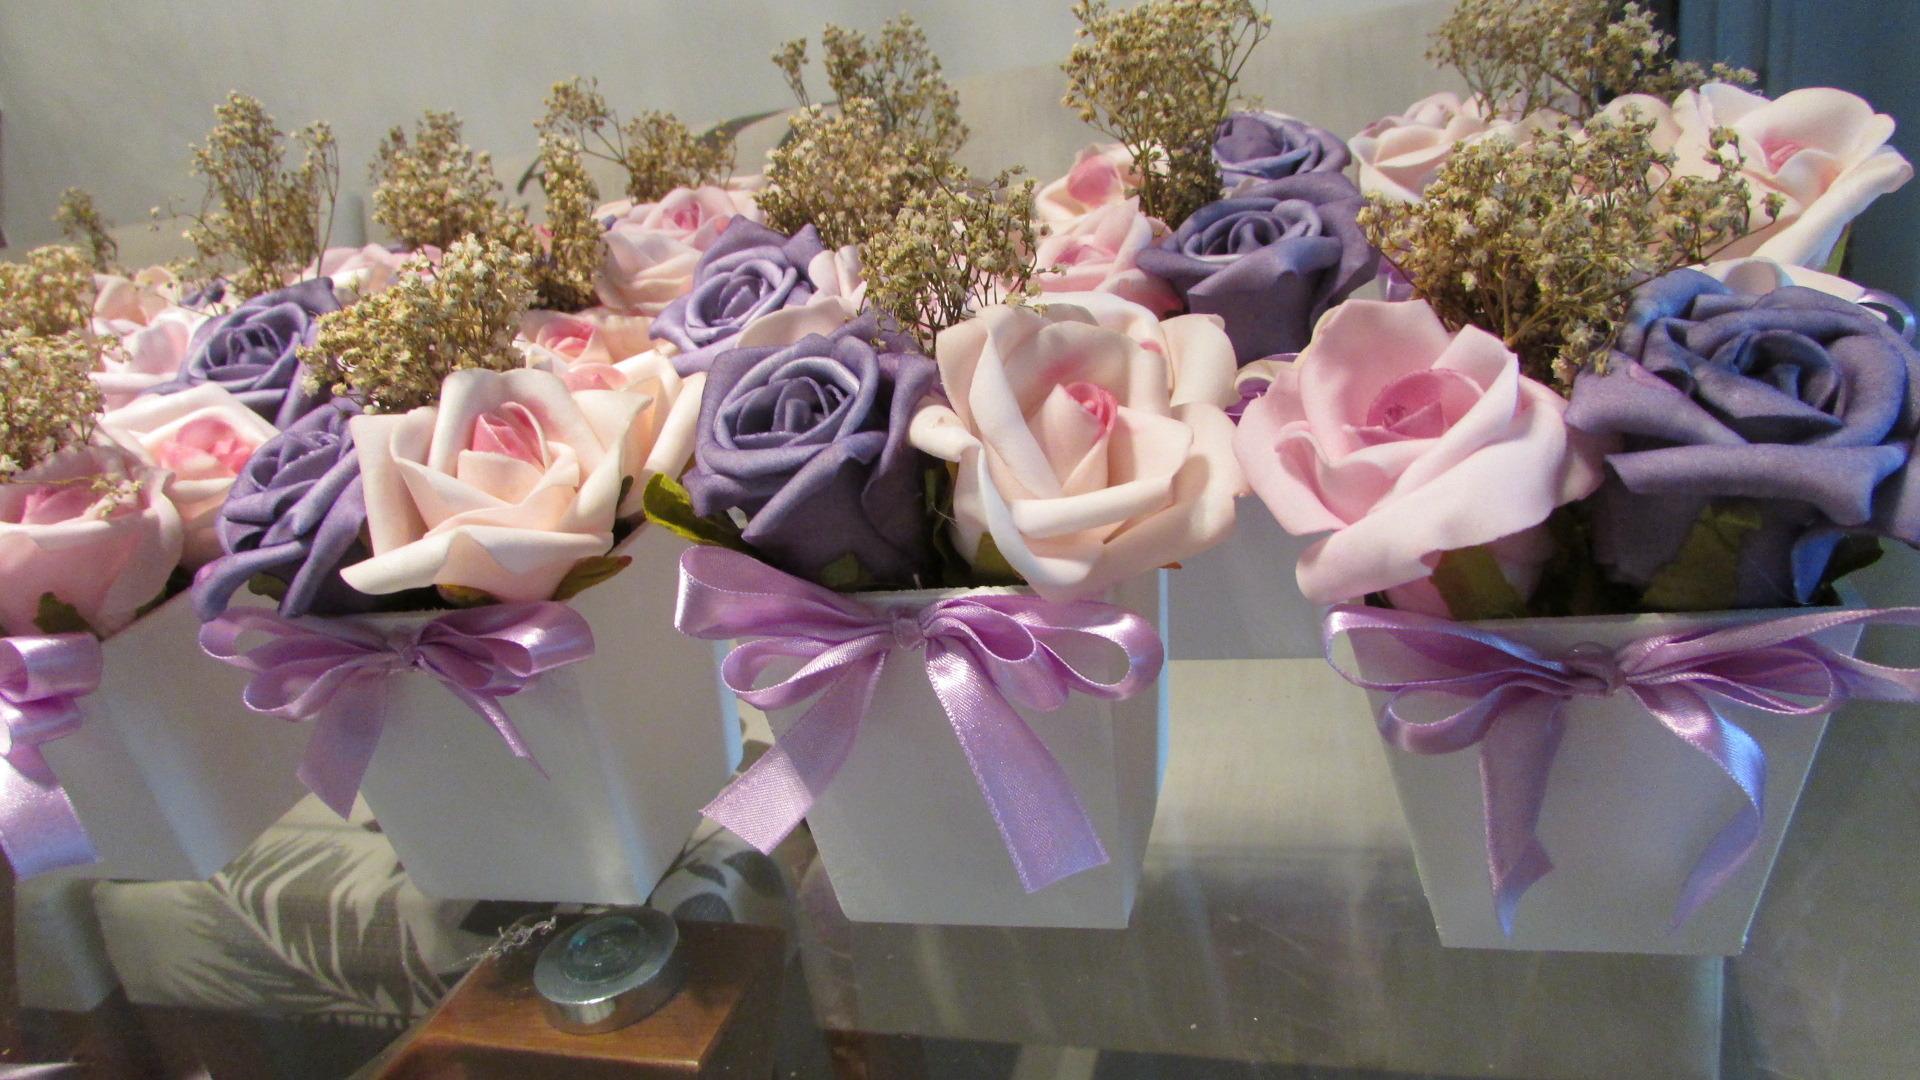 kit decoracao casamento : kit decoracao casamento:festa casamento kit casamento bouquet vasinhos di alex mini bouquet